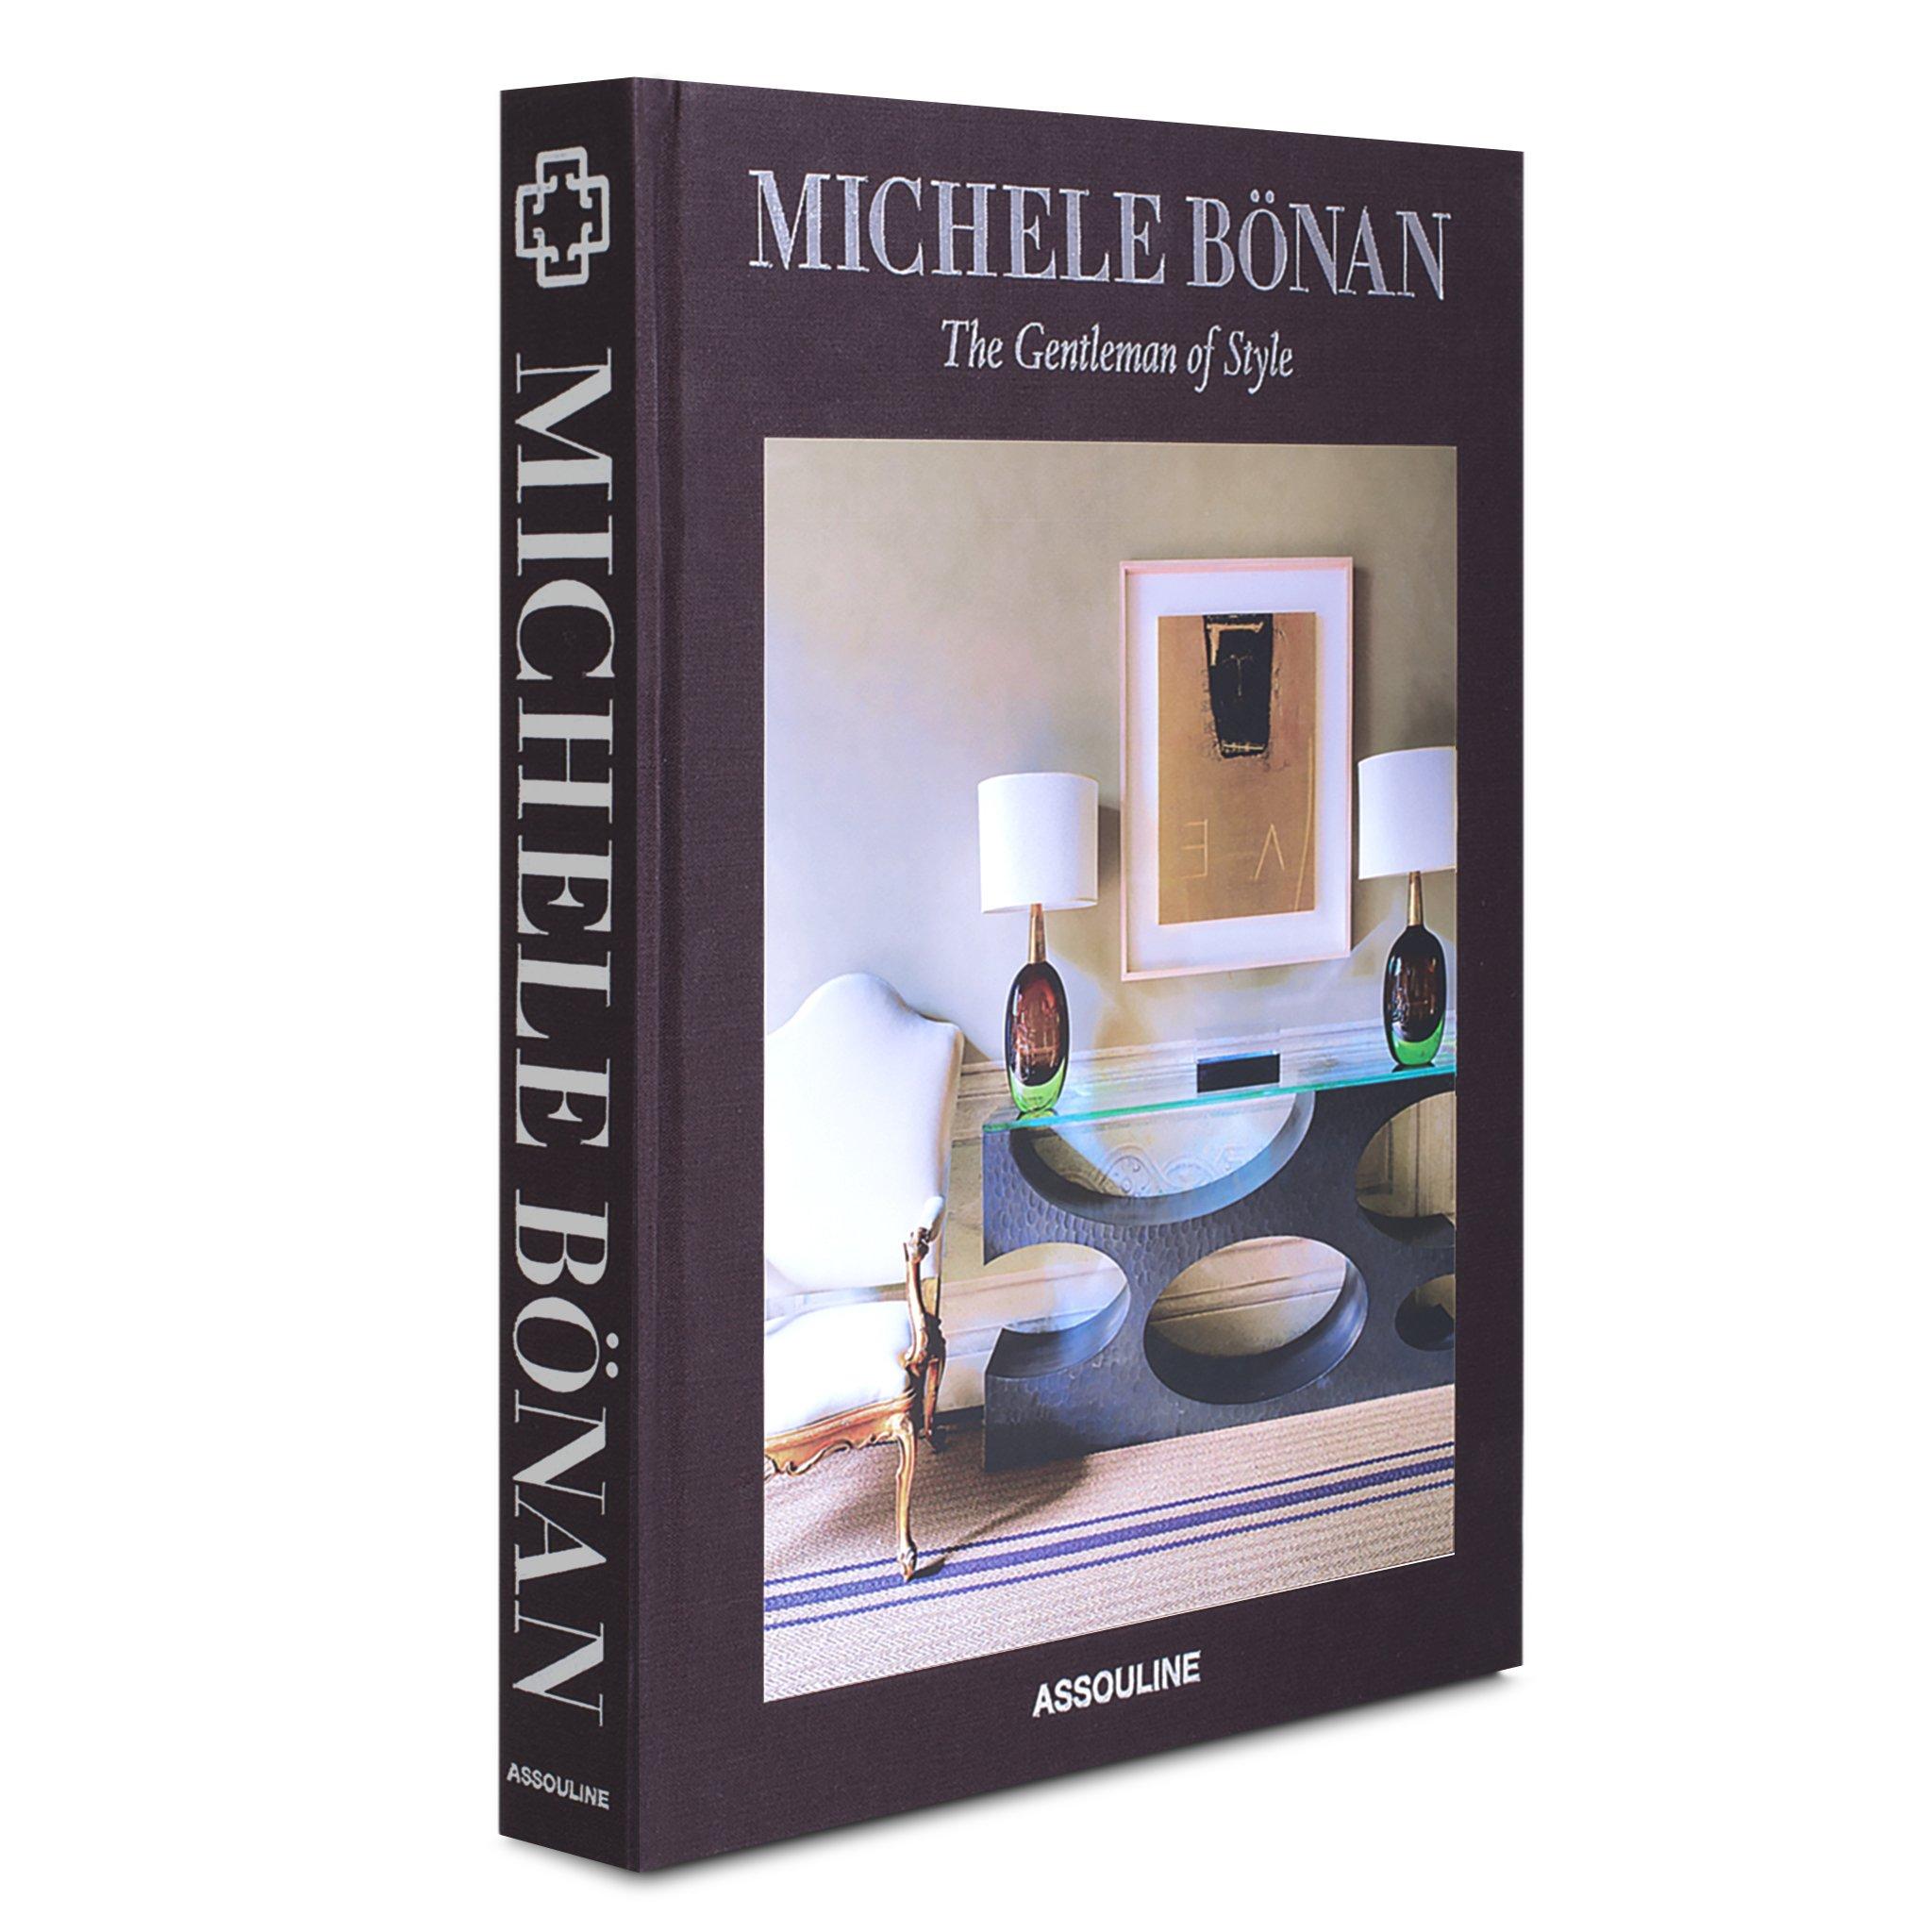 Michele Bonan Accessori Bagno.Michele Bonan The Gentleman Of Style Amazon It Michele